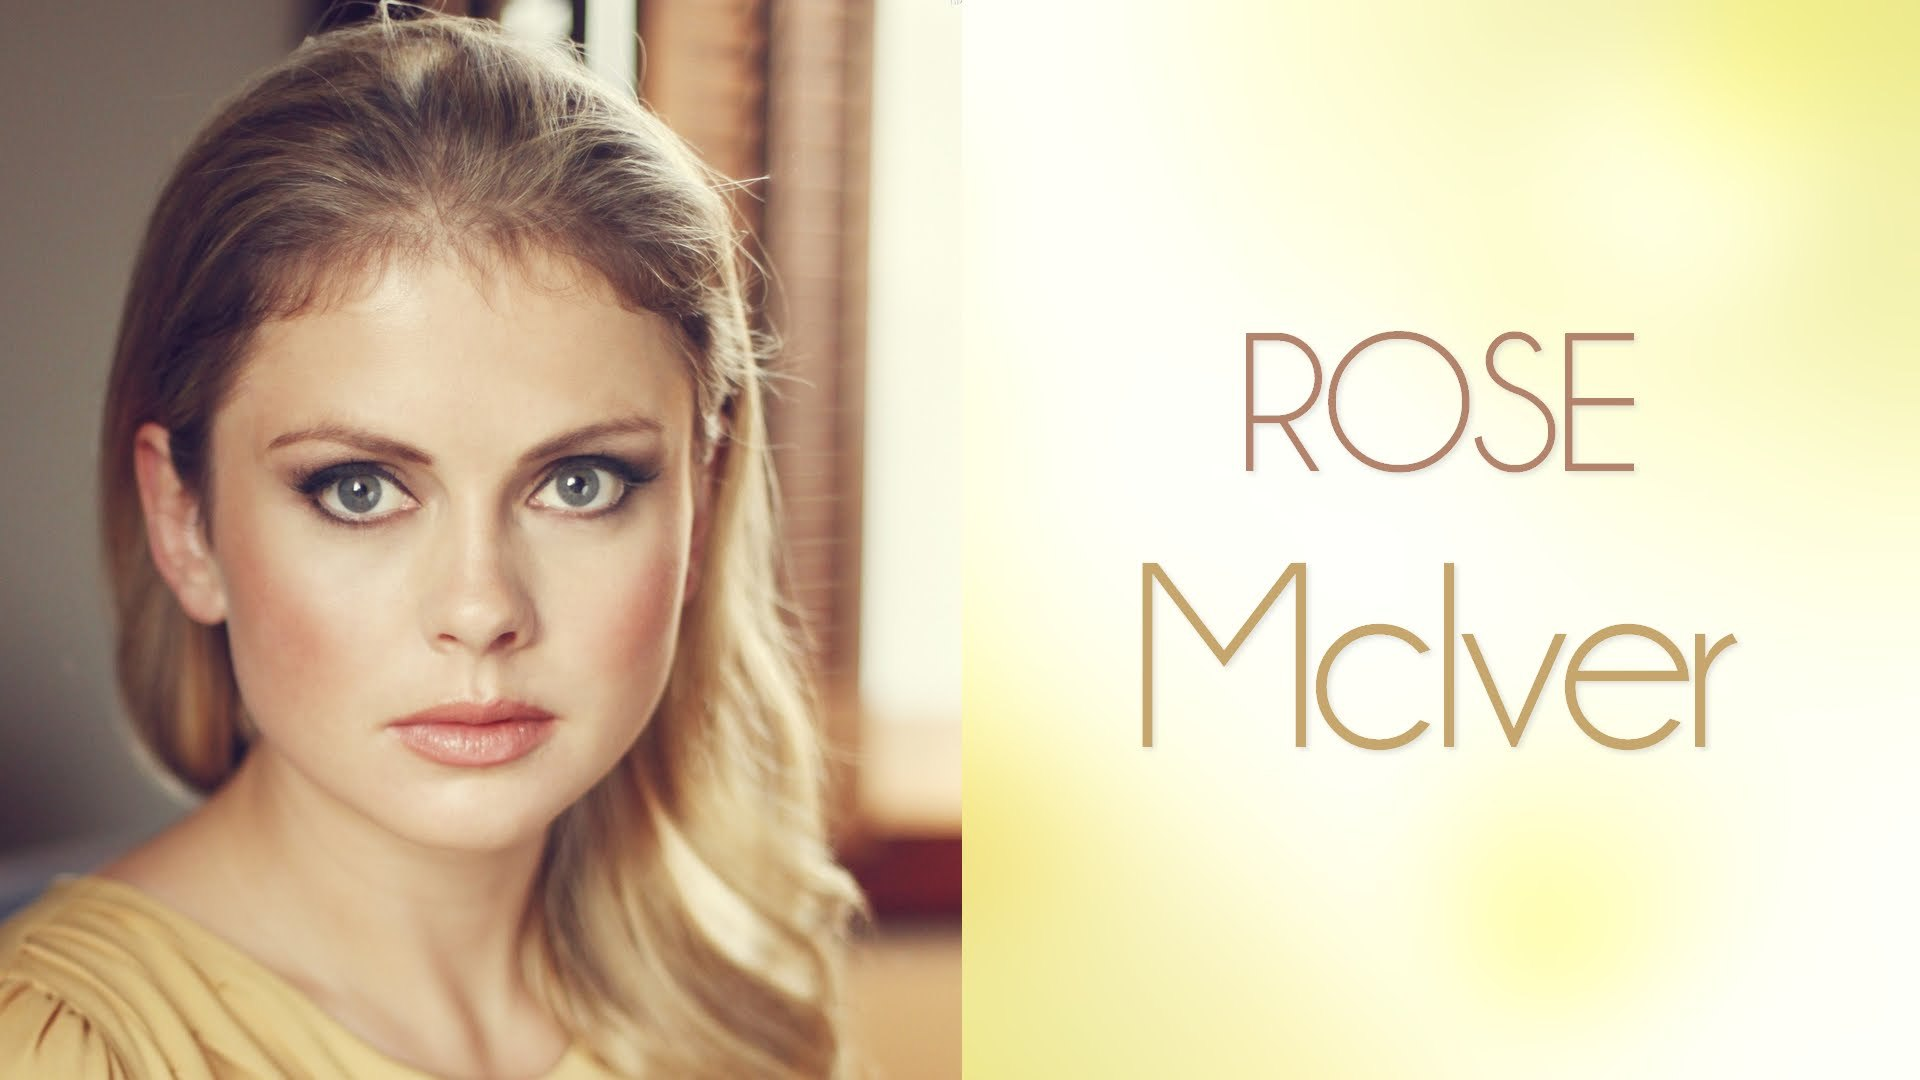 Rose Mciver HD Background